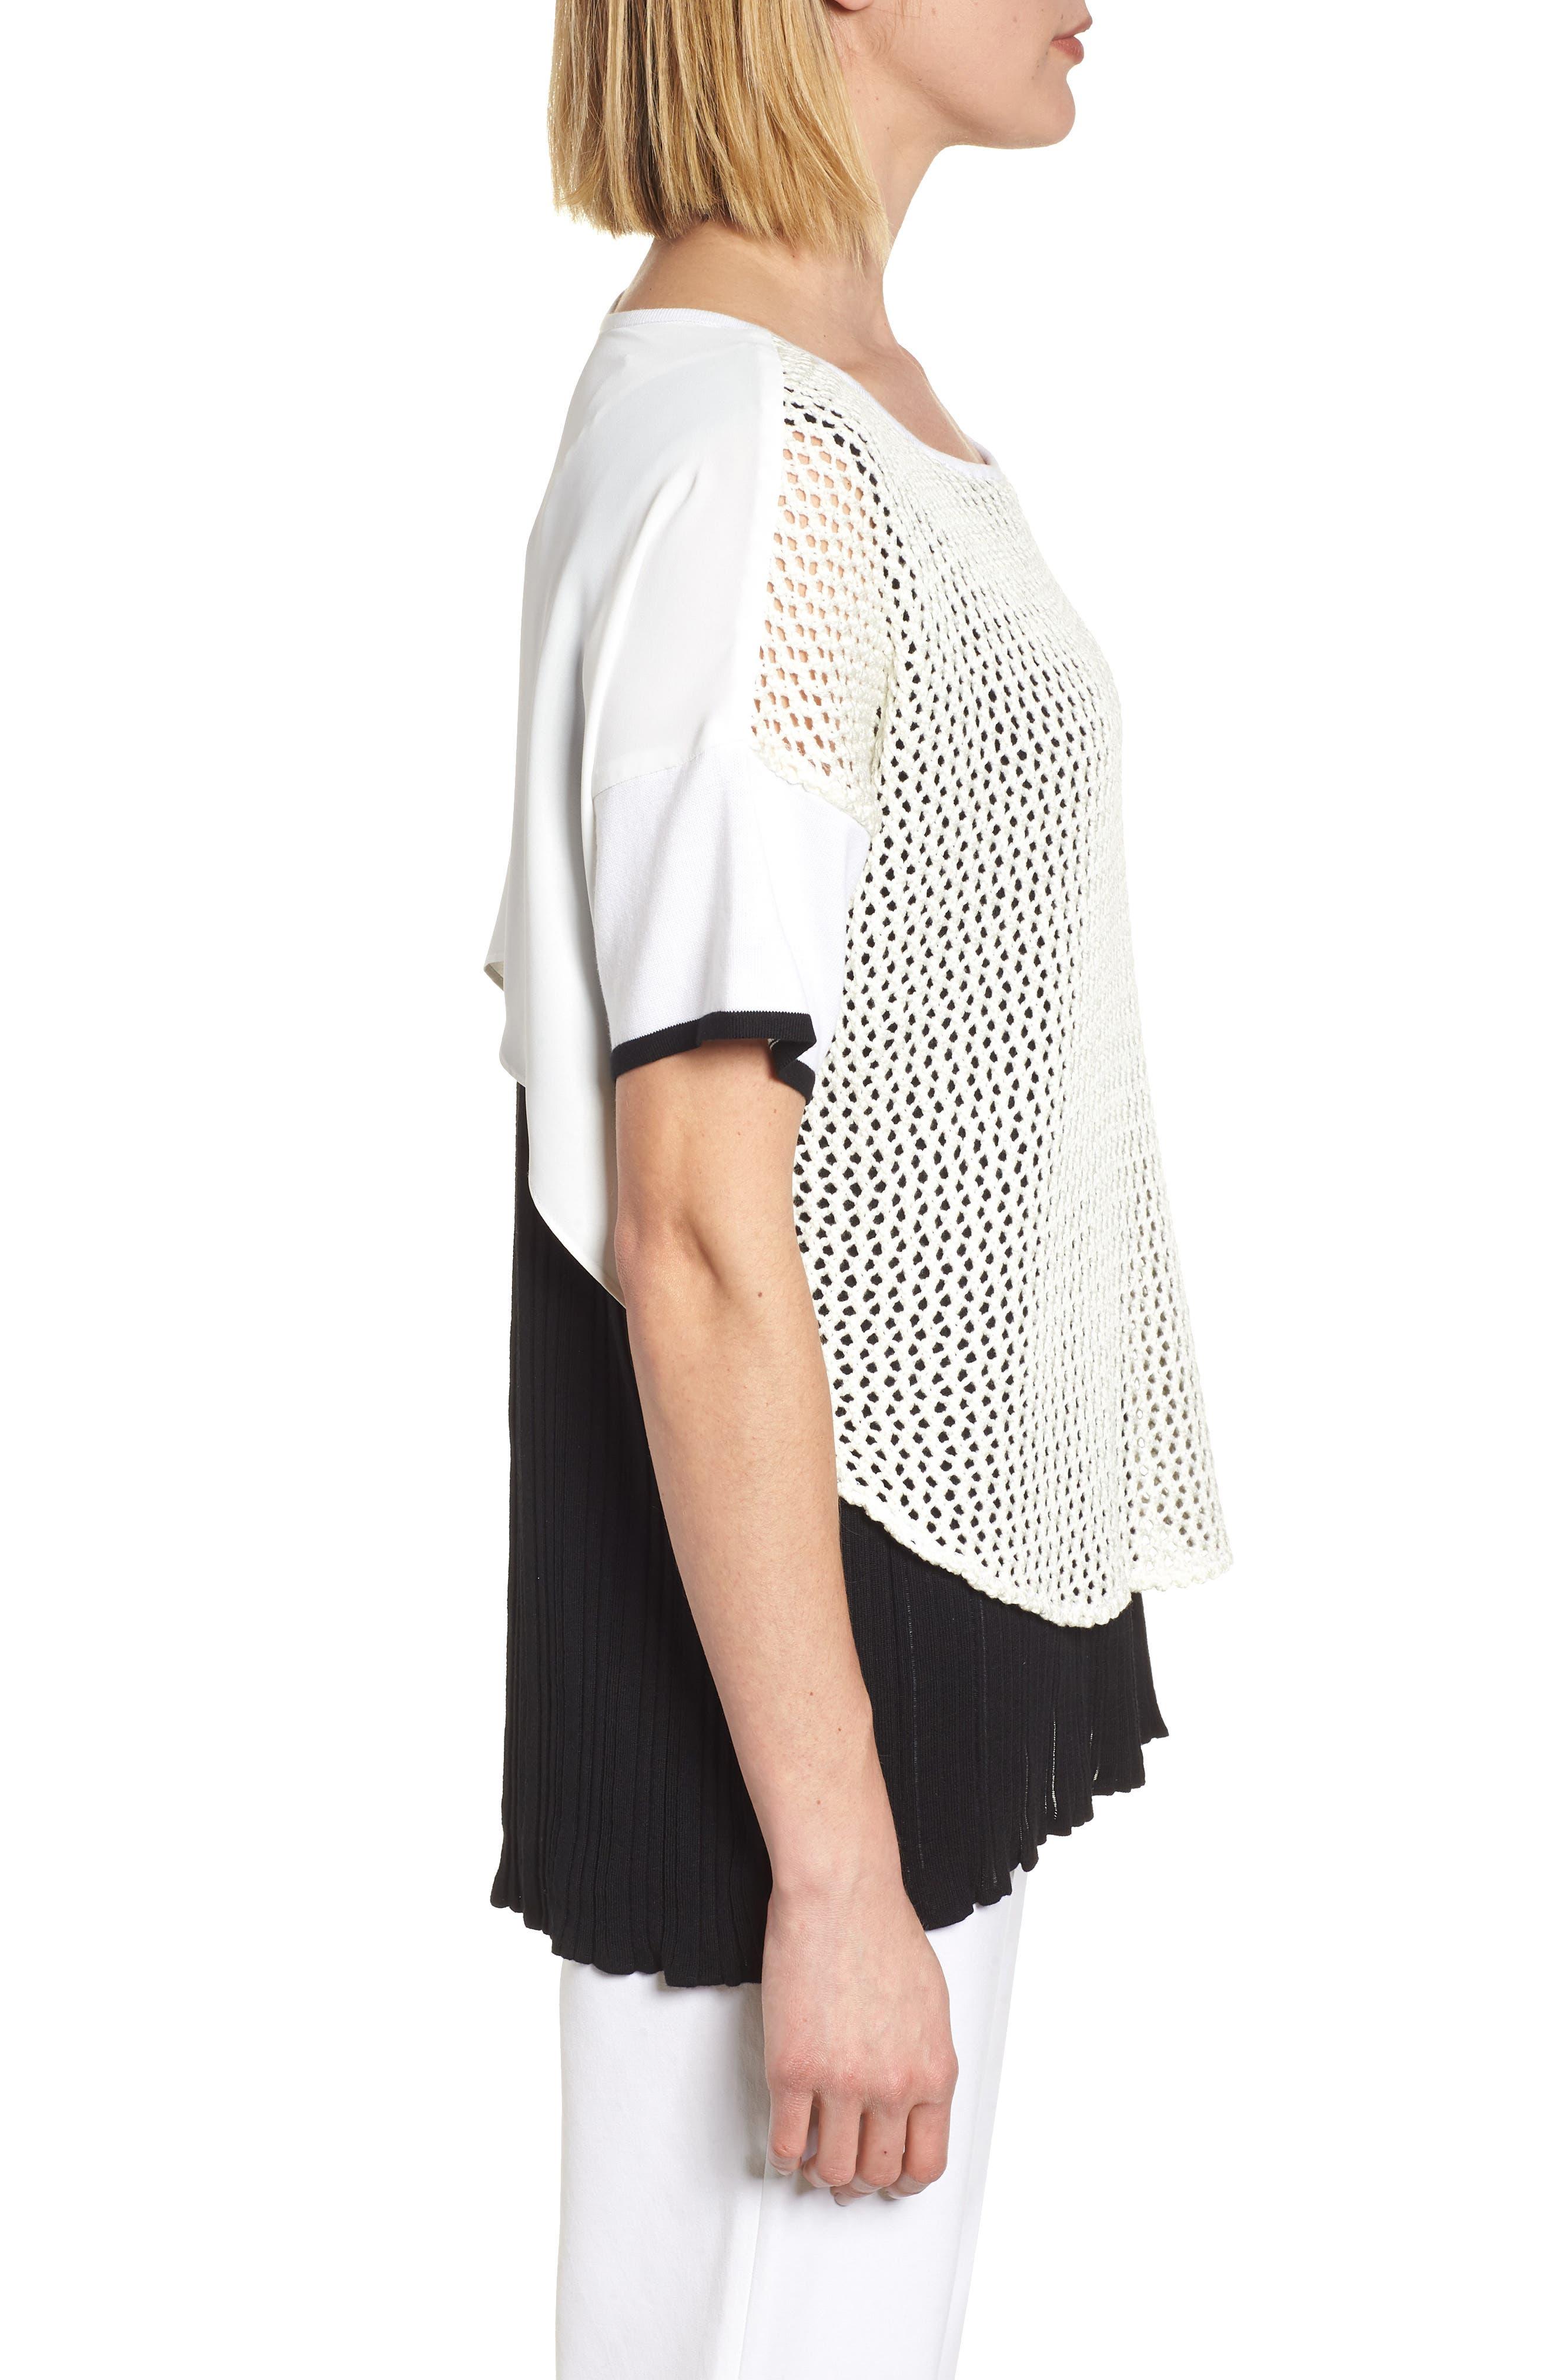 Mixed Media Short Sleeve Tunic Top,                             Alternate thumbnail 3, color,                             WHITE/ BLACK